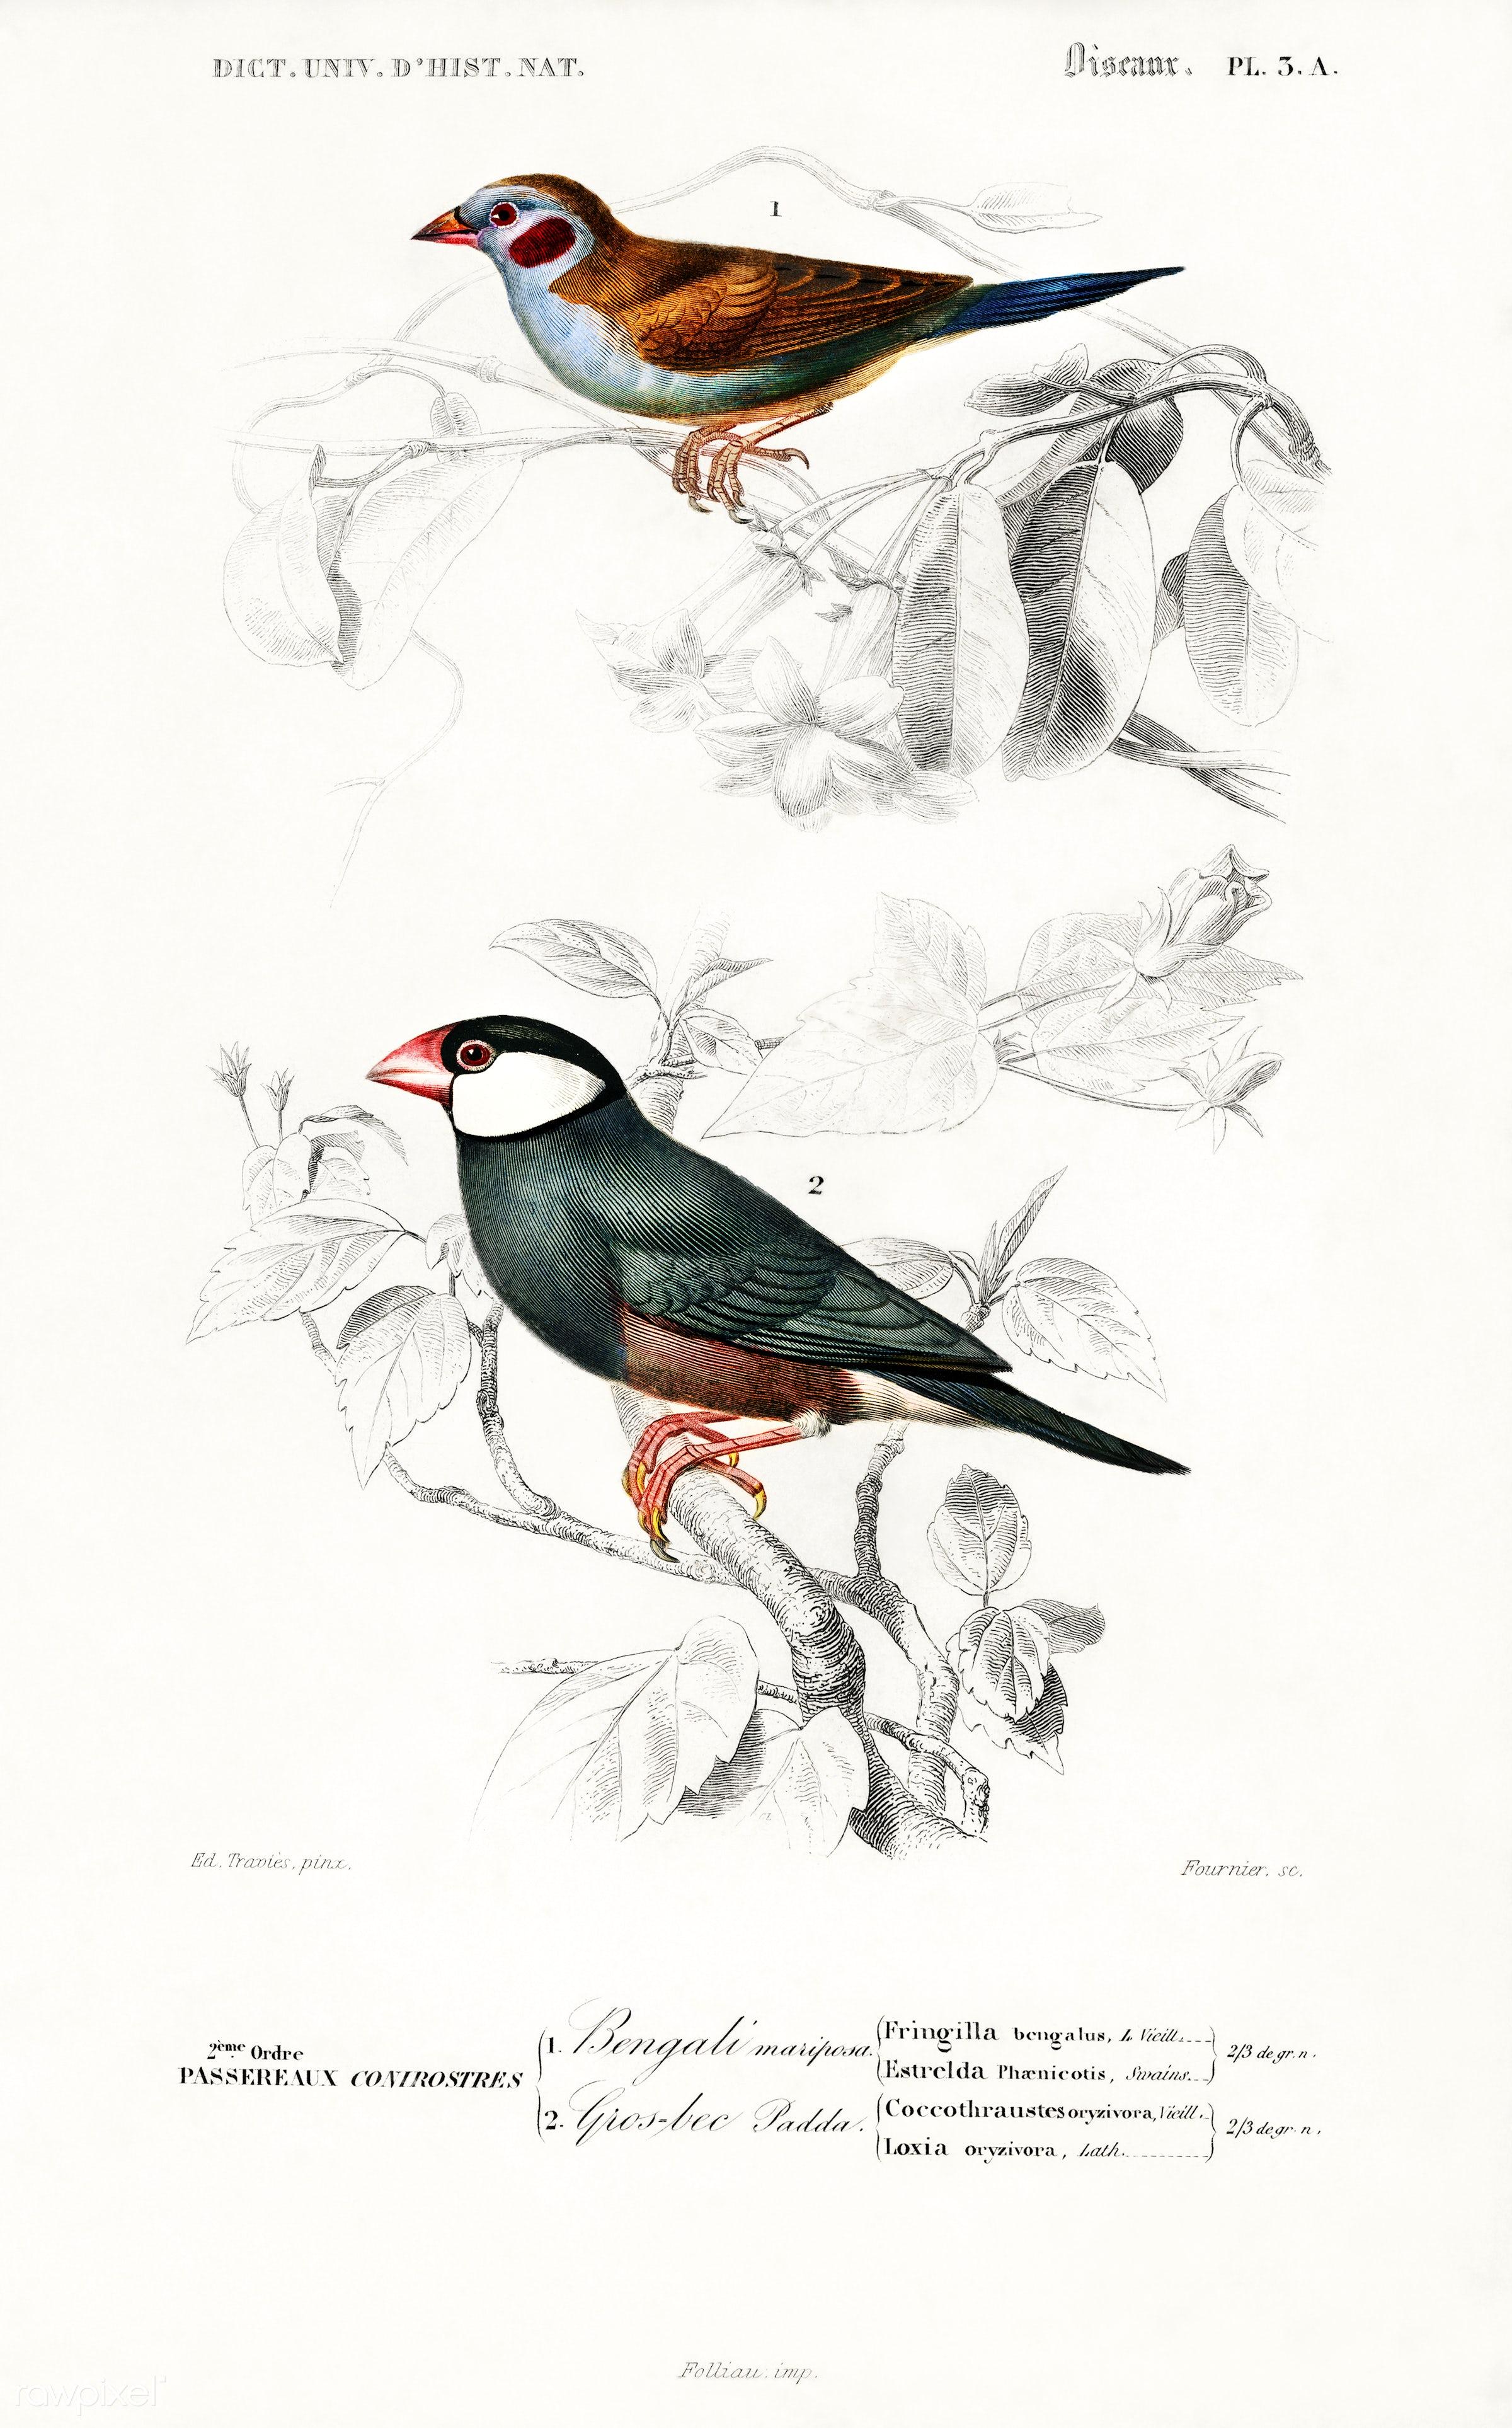 Red-cheeked Cordonbleu (Uraeginthus Bengalus) and Java Sparrow (Lonchura Oryzivora) illustrated by Charles Dessalines D...